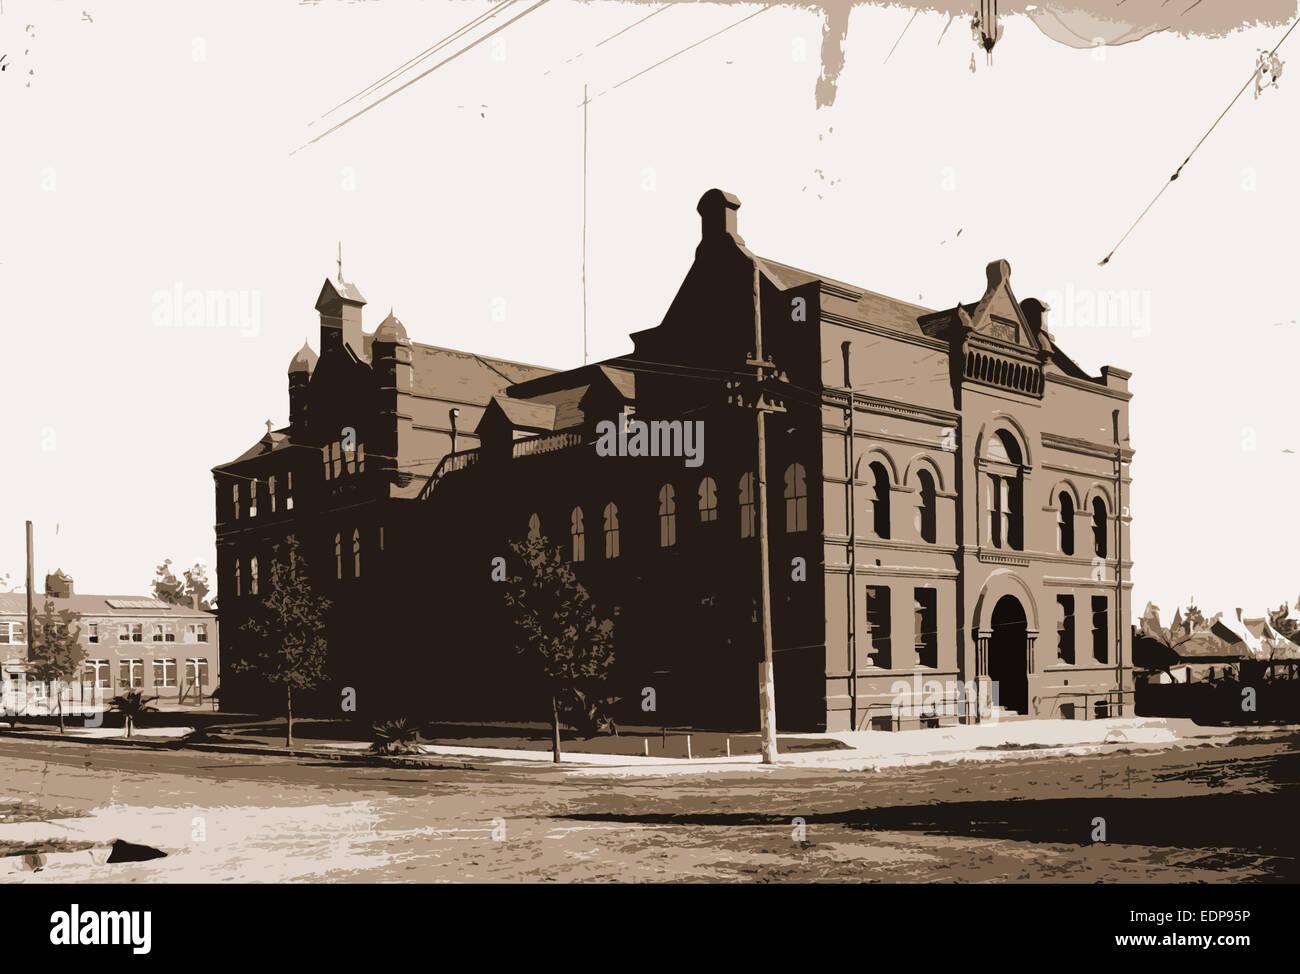 Throop Institute, Pasadena, Educational facilities, Universities & colleges, United States, California, Pasadena, - Stock Image